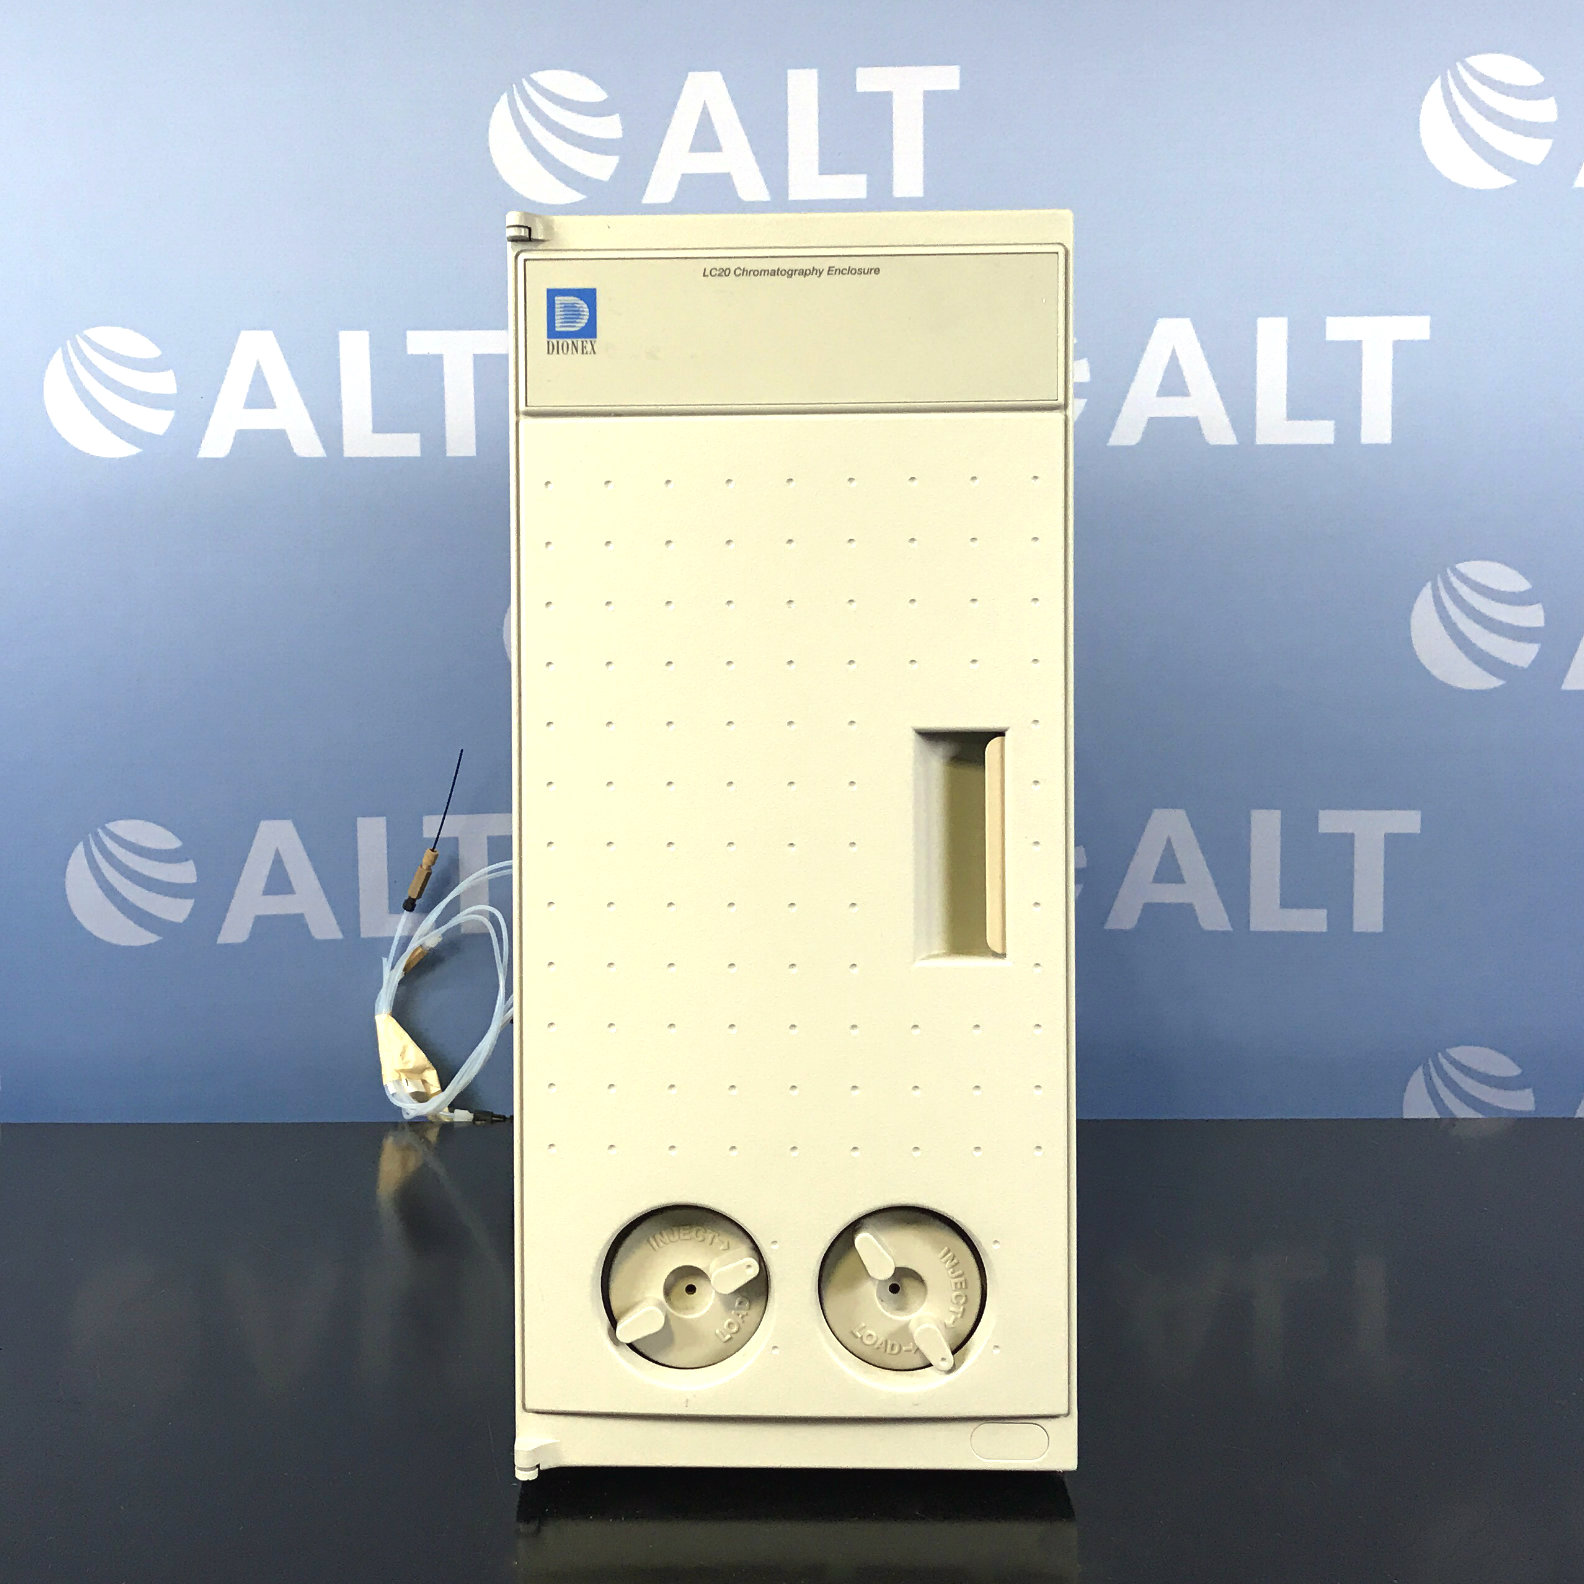 Dionex LC20-1 Chromatography Enclosure Image